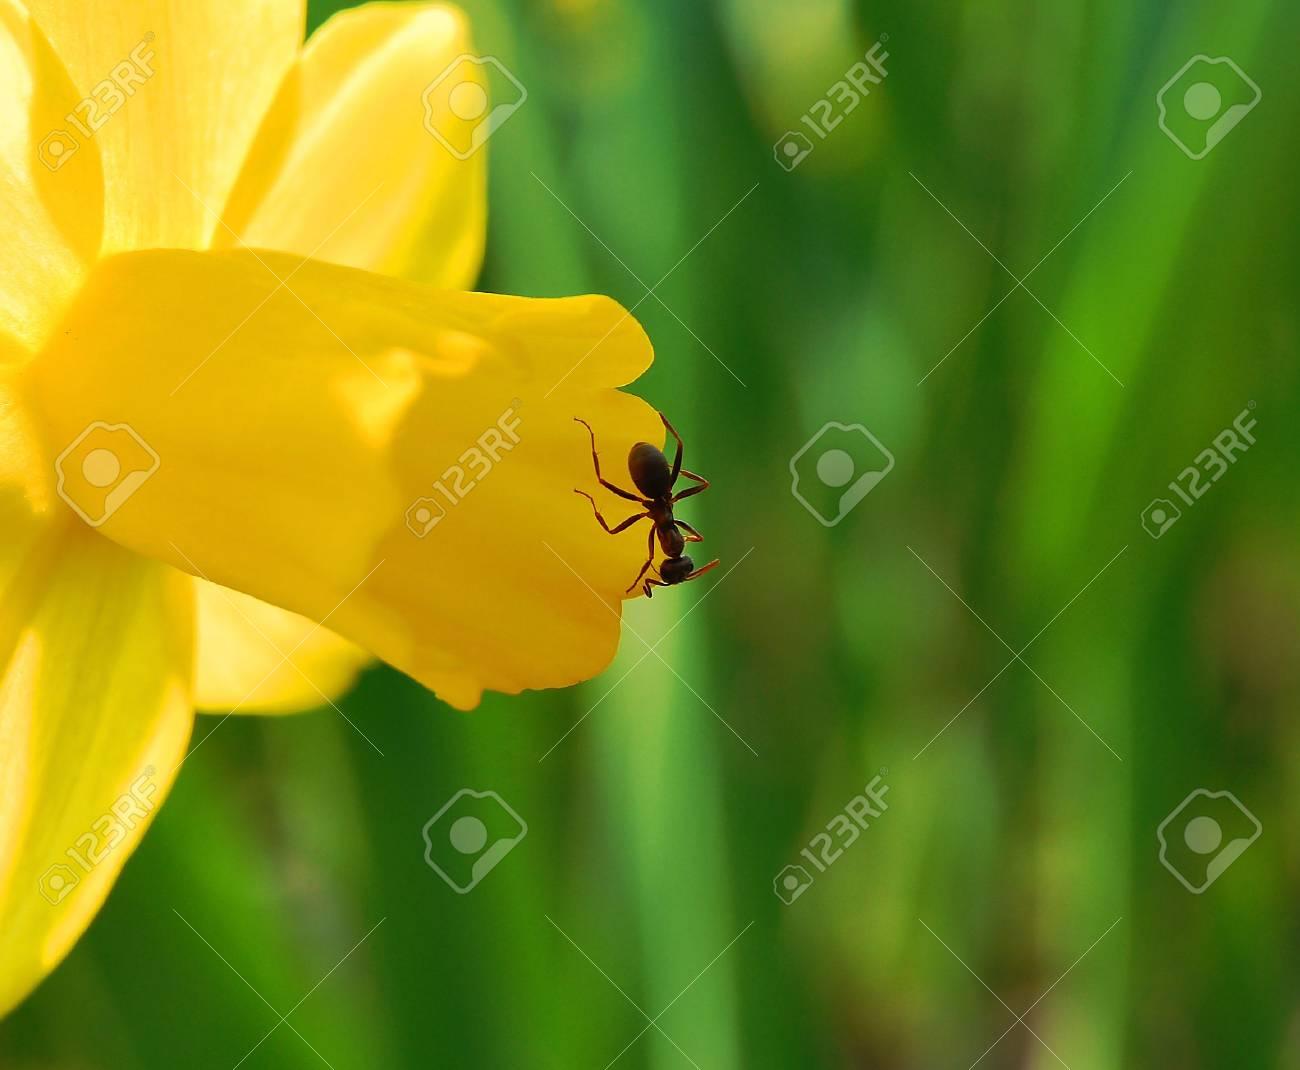 ant on yellow petal - 4666859